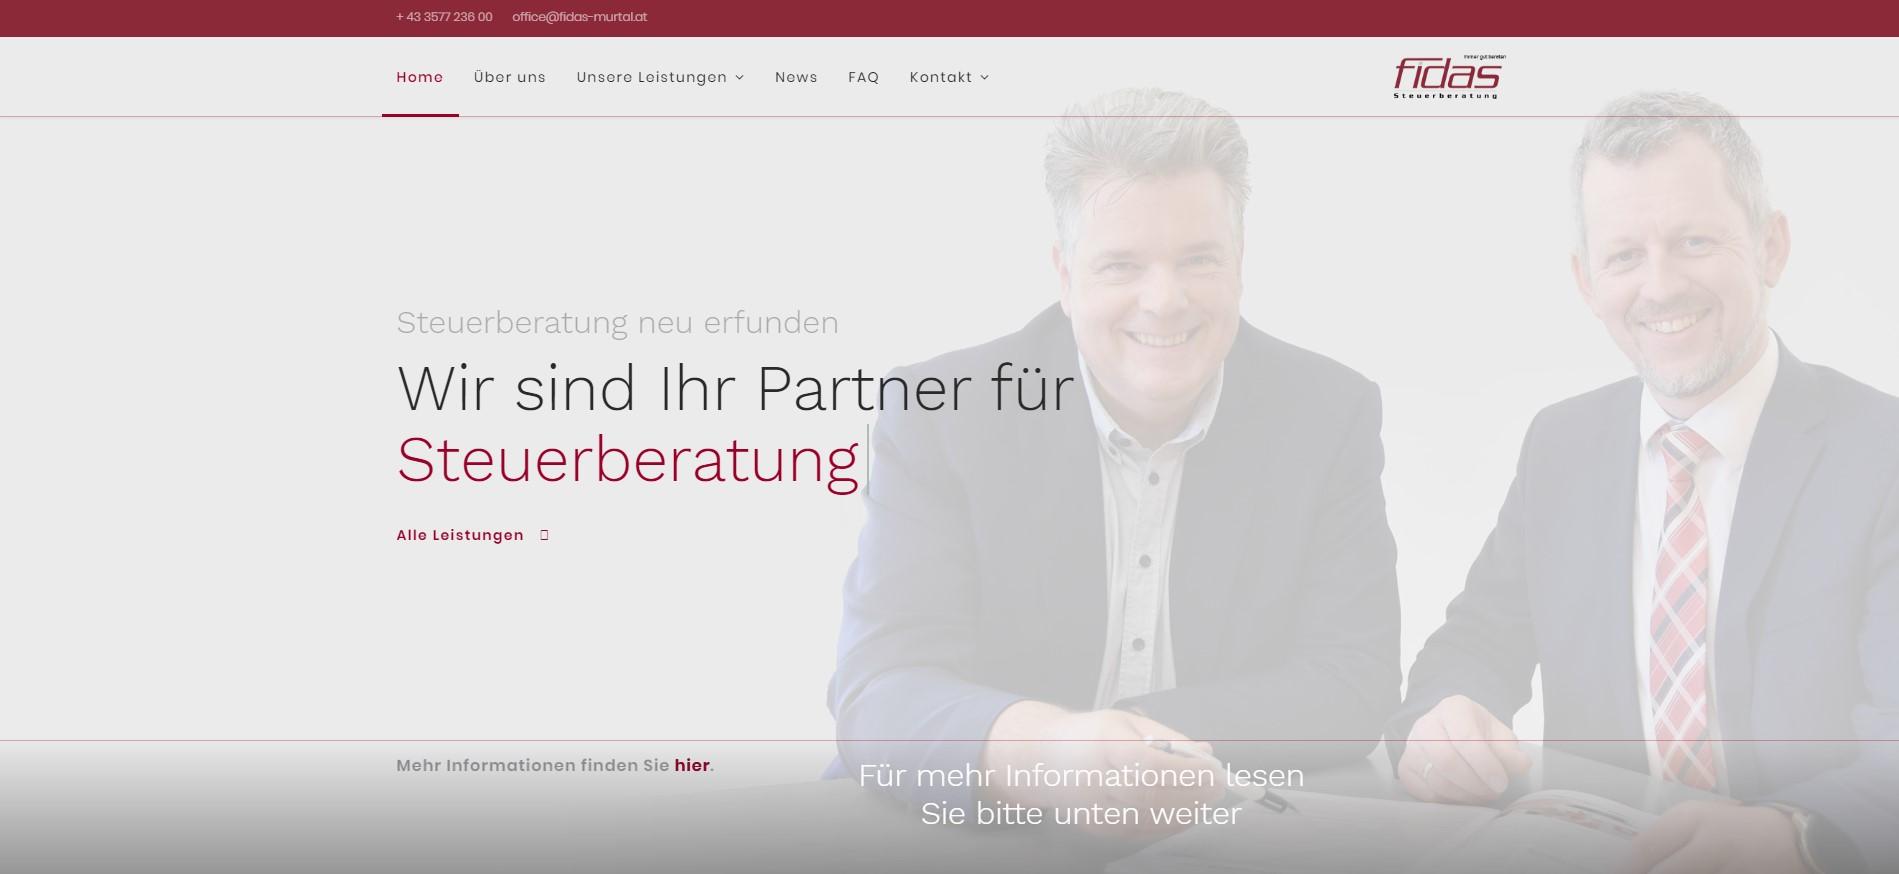 Dating Austria English Oberwlz Stadt, Partnerbrse Fr